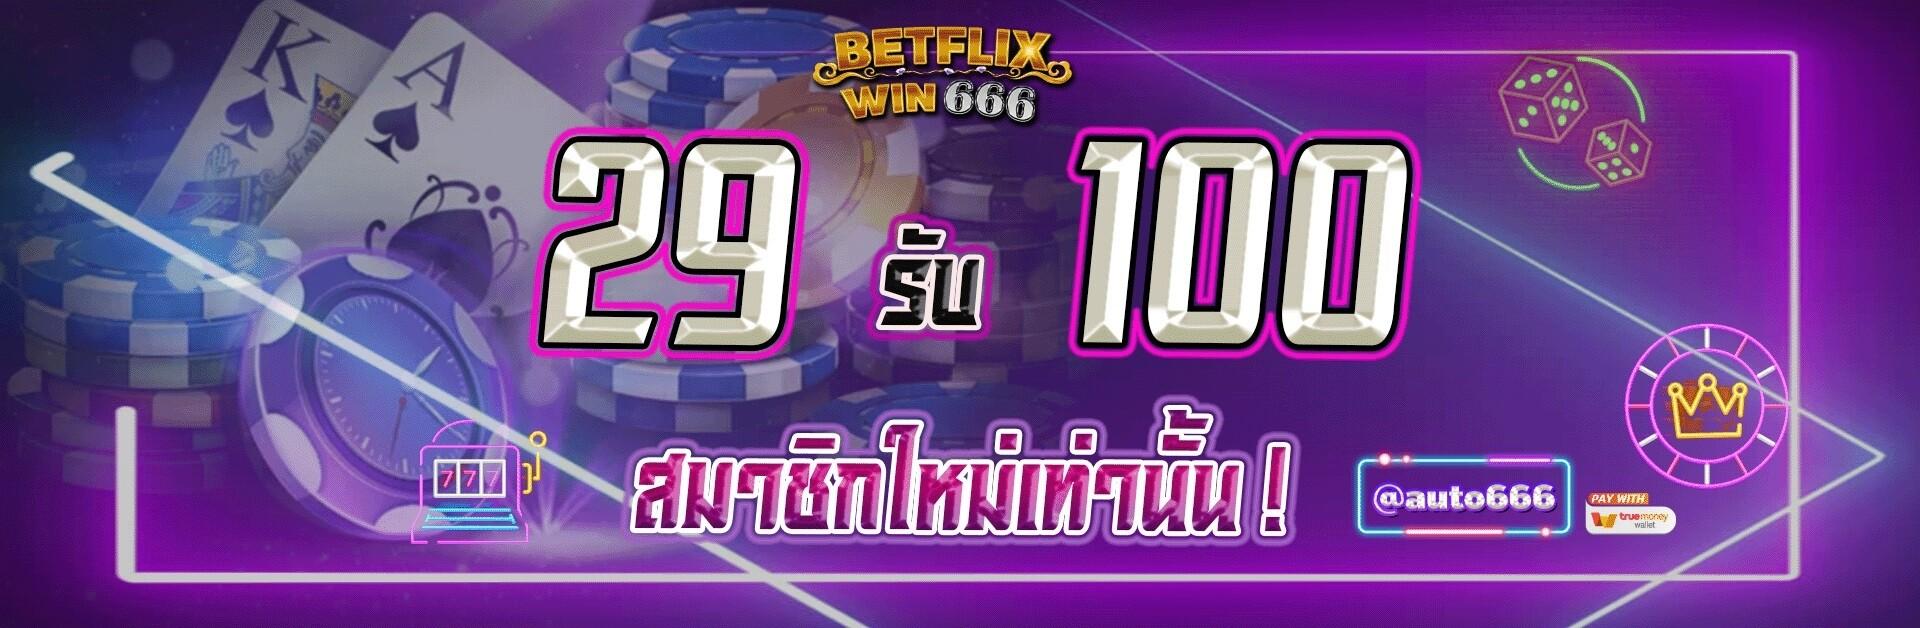 betflix 998